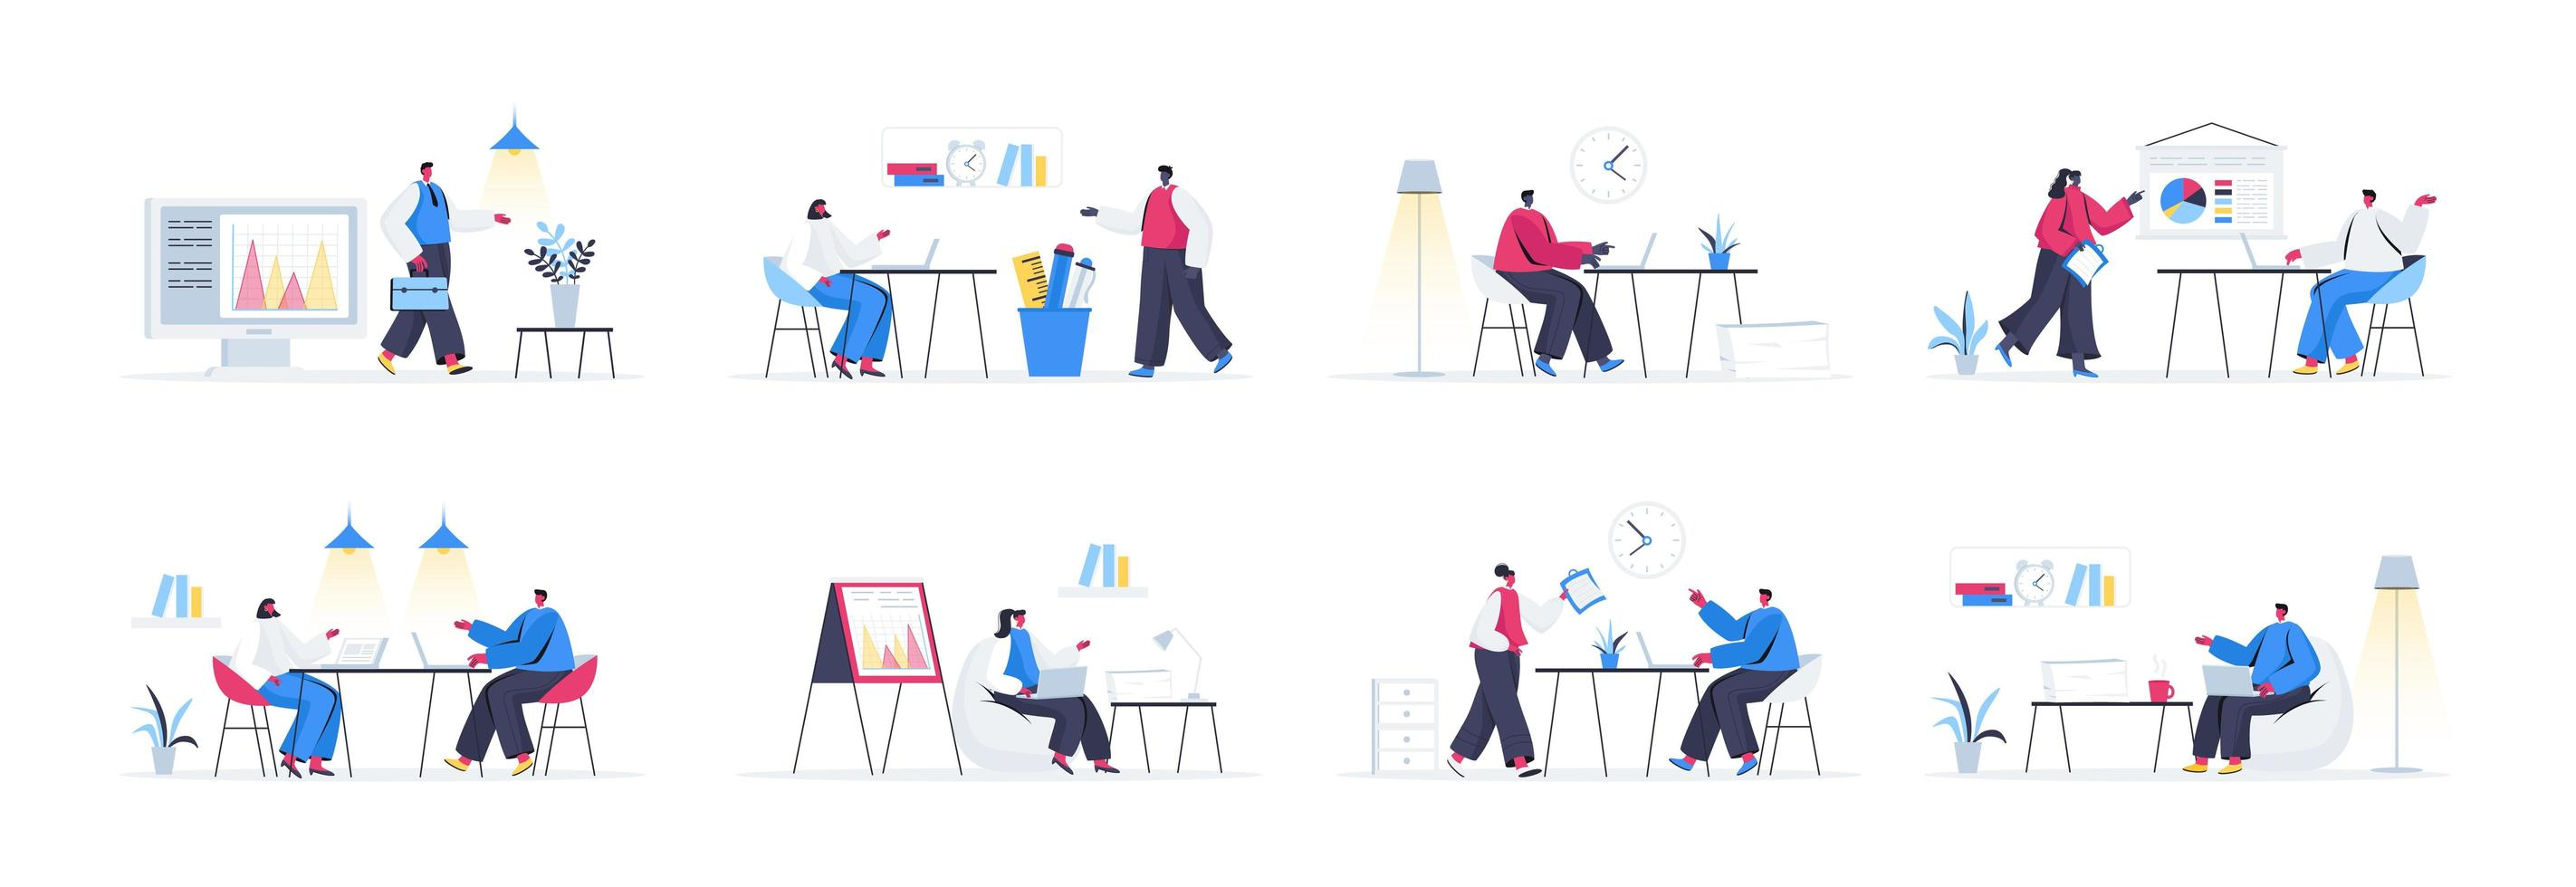 Bündel von Office-Management-Szenen vektor